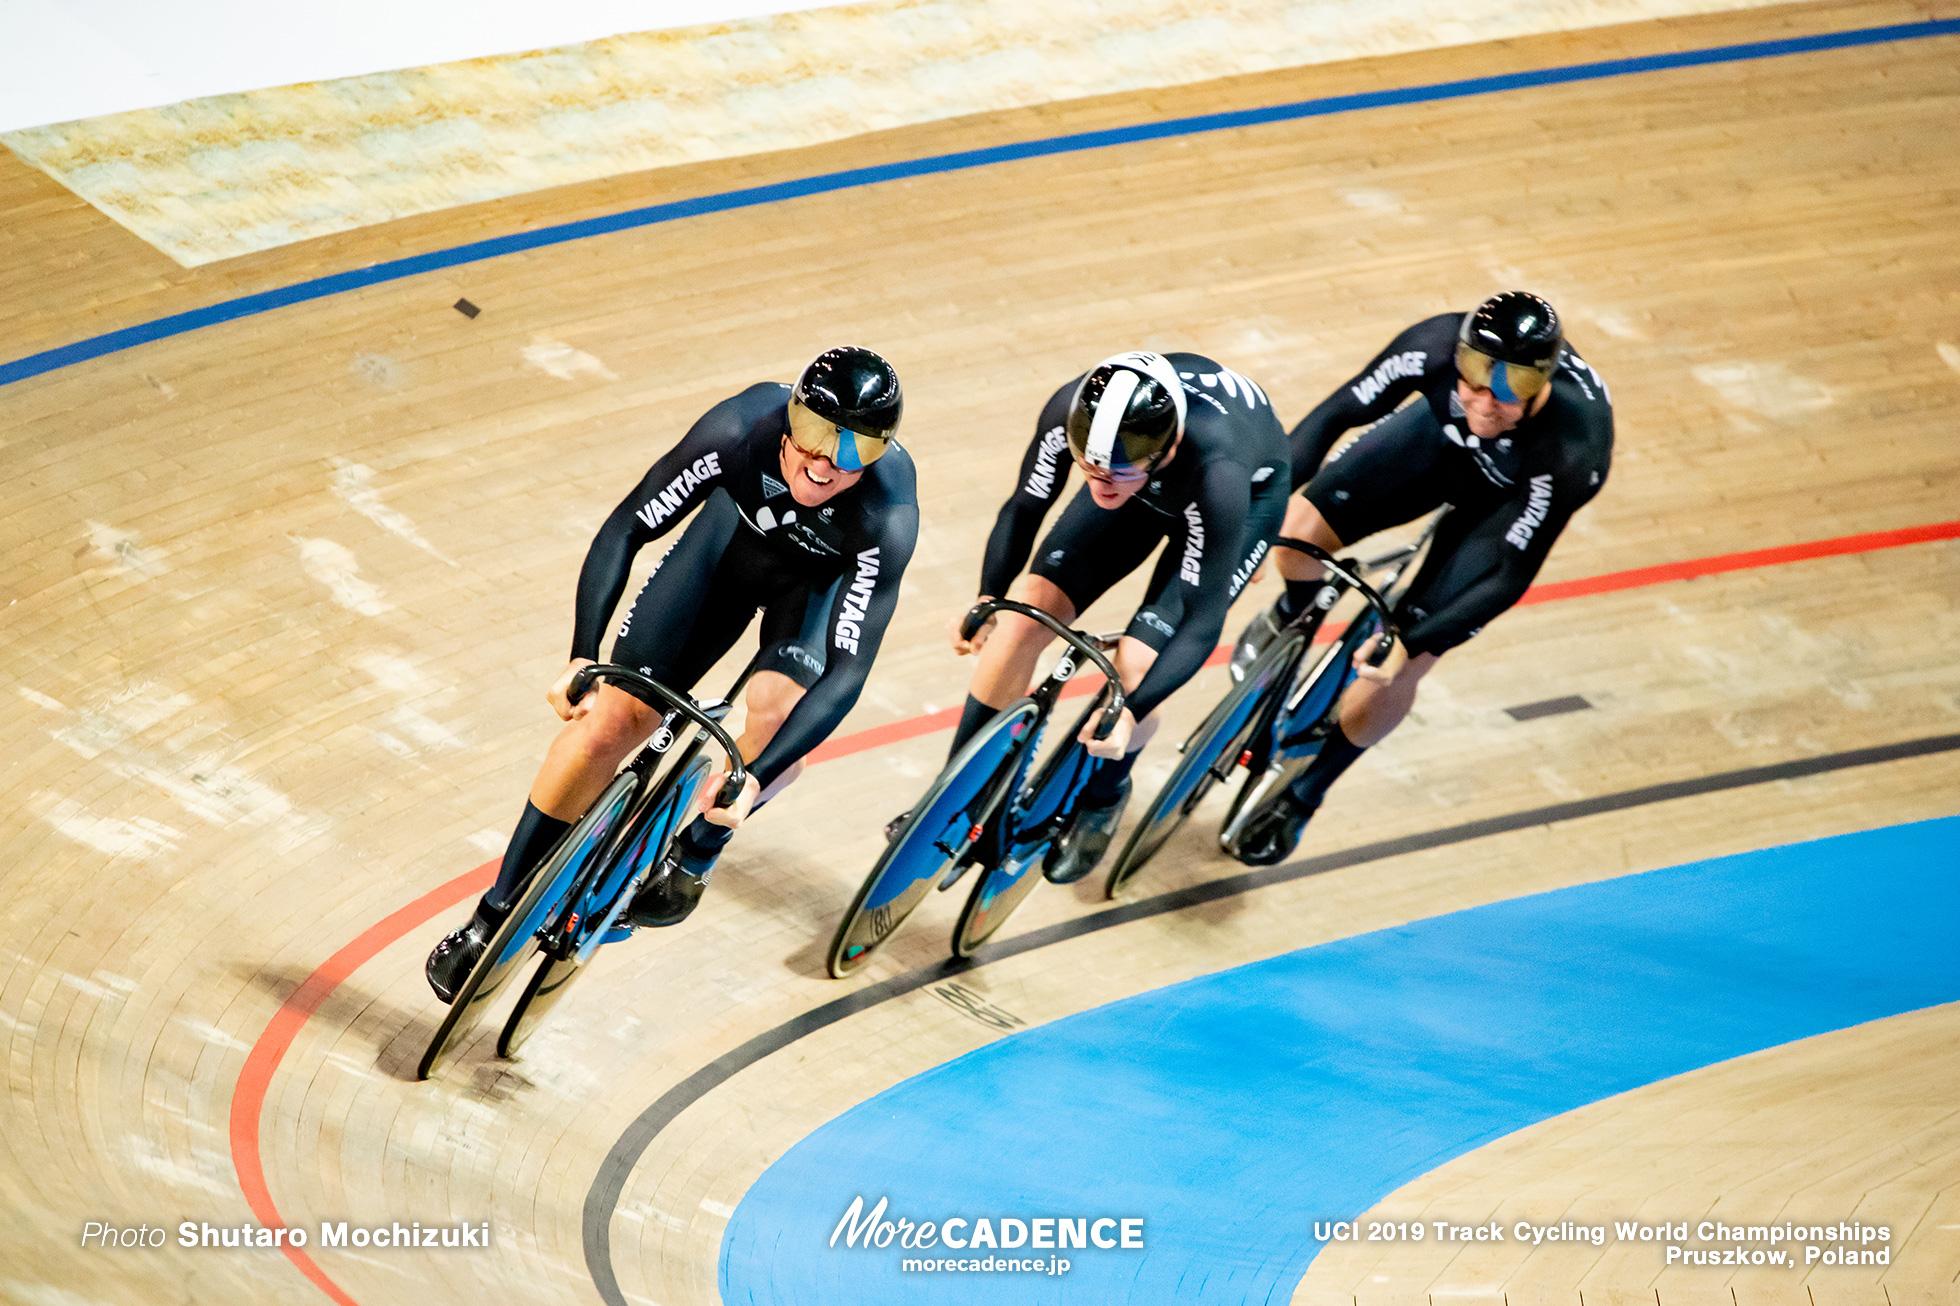 Men's Team Sprint / 2019 Track Cycling World Championships Pruszków, Poland